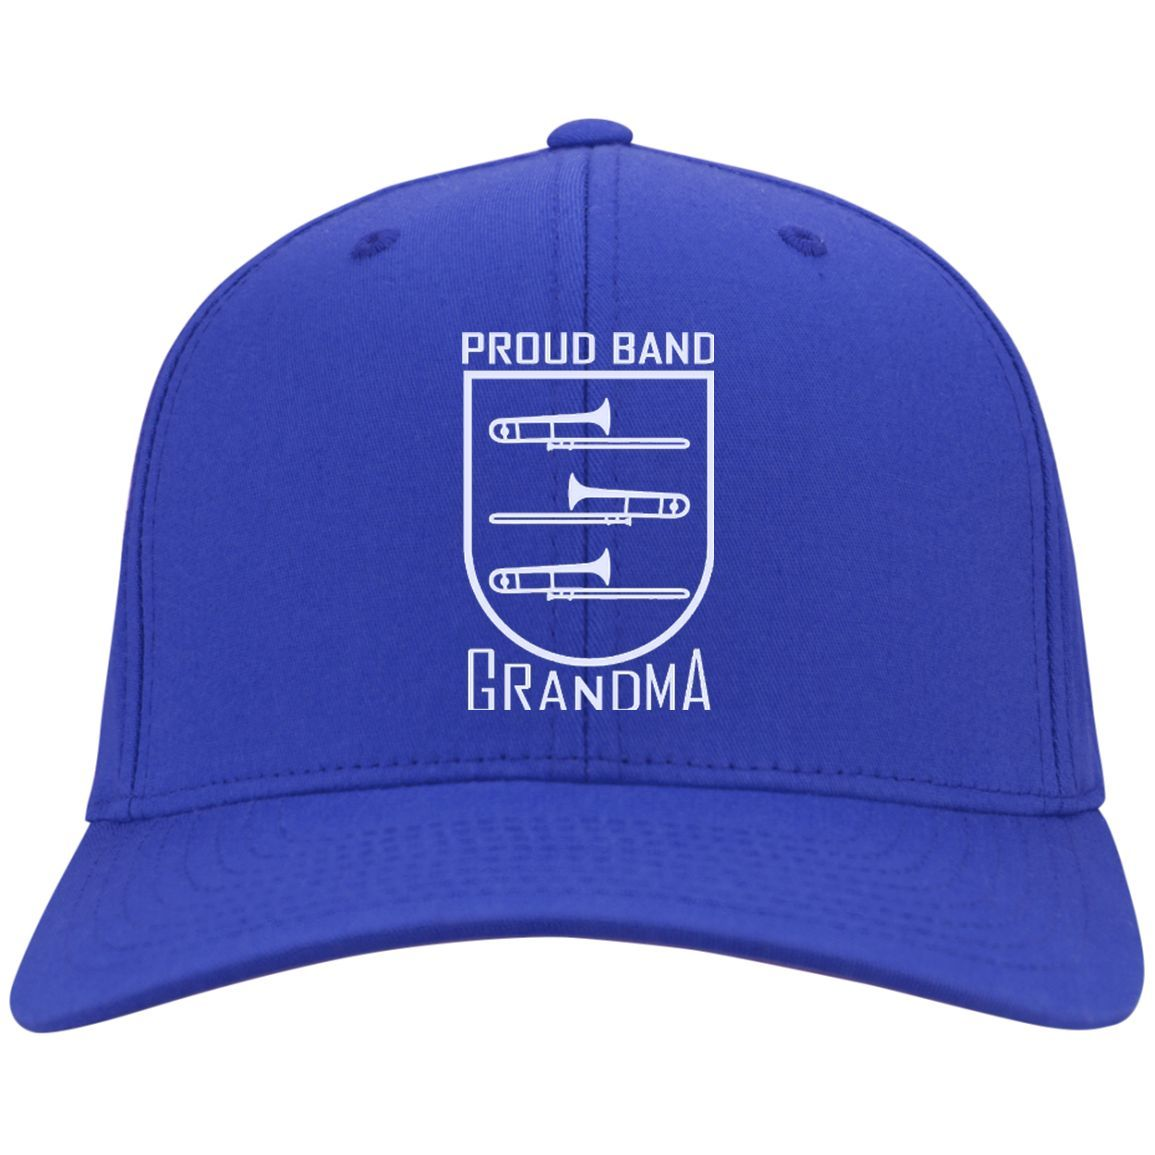 Trombone Grandma Crest Snapback Cap